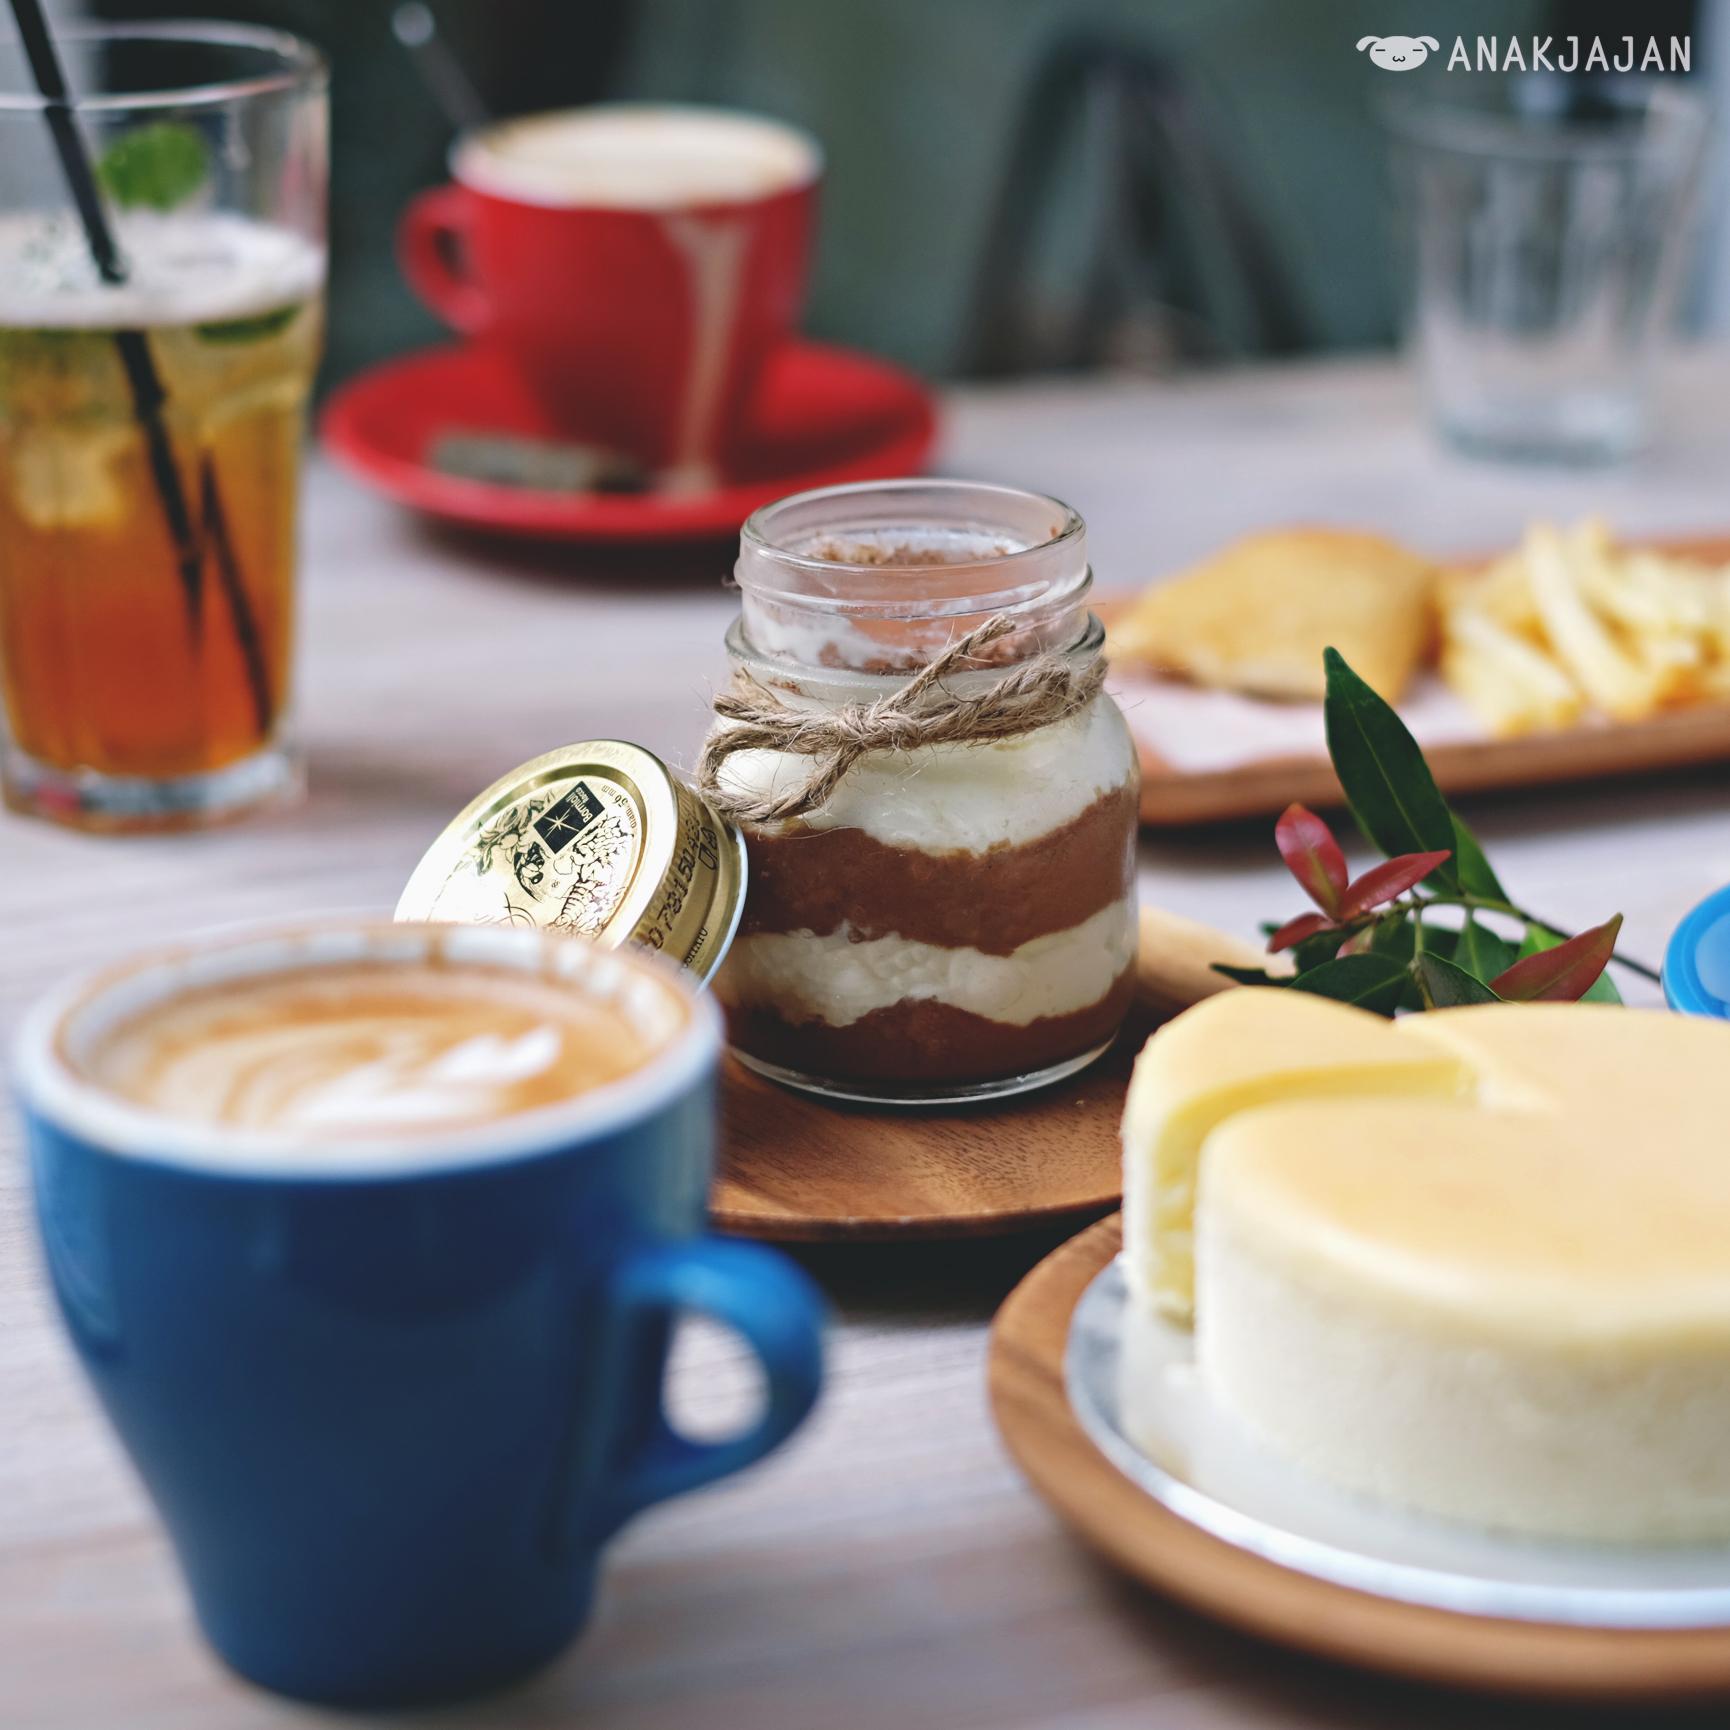 CHEESESS Cheesecake Cafe – Jakarta Indonesia | ANAKJAJAN COM